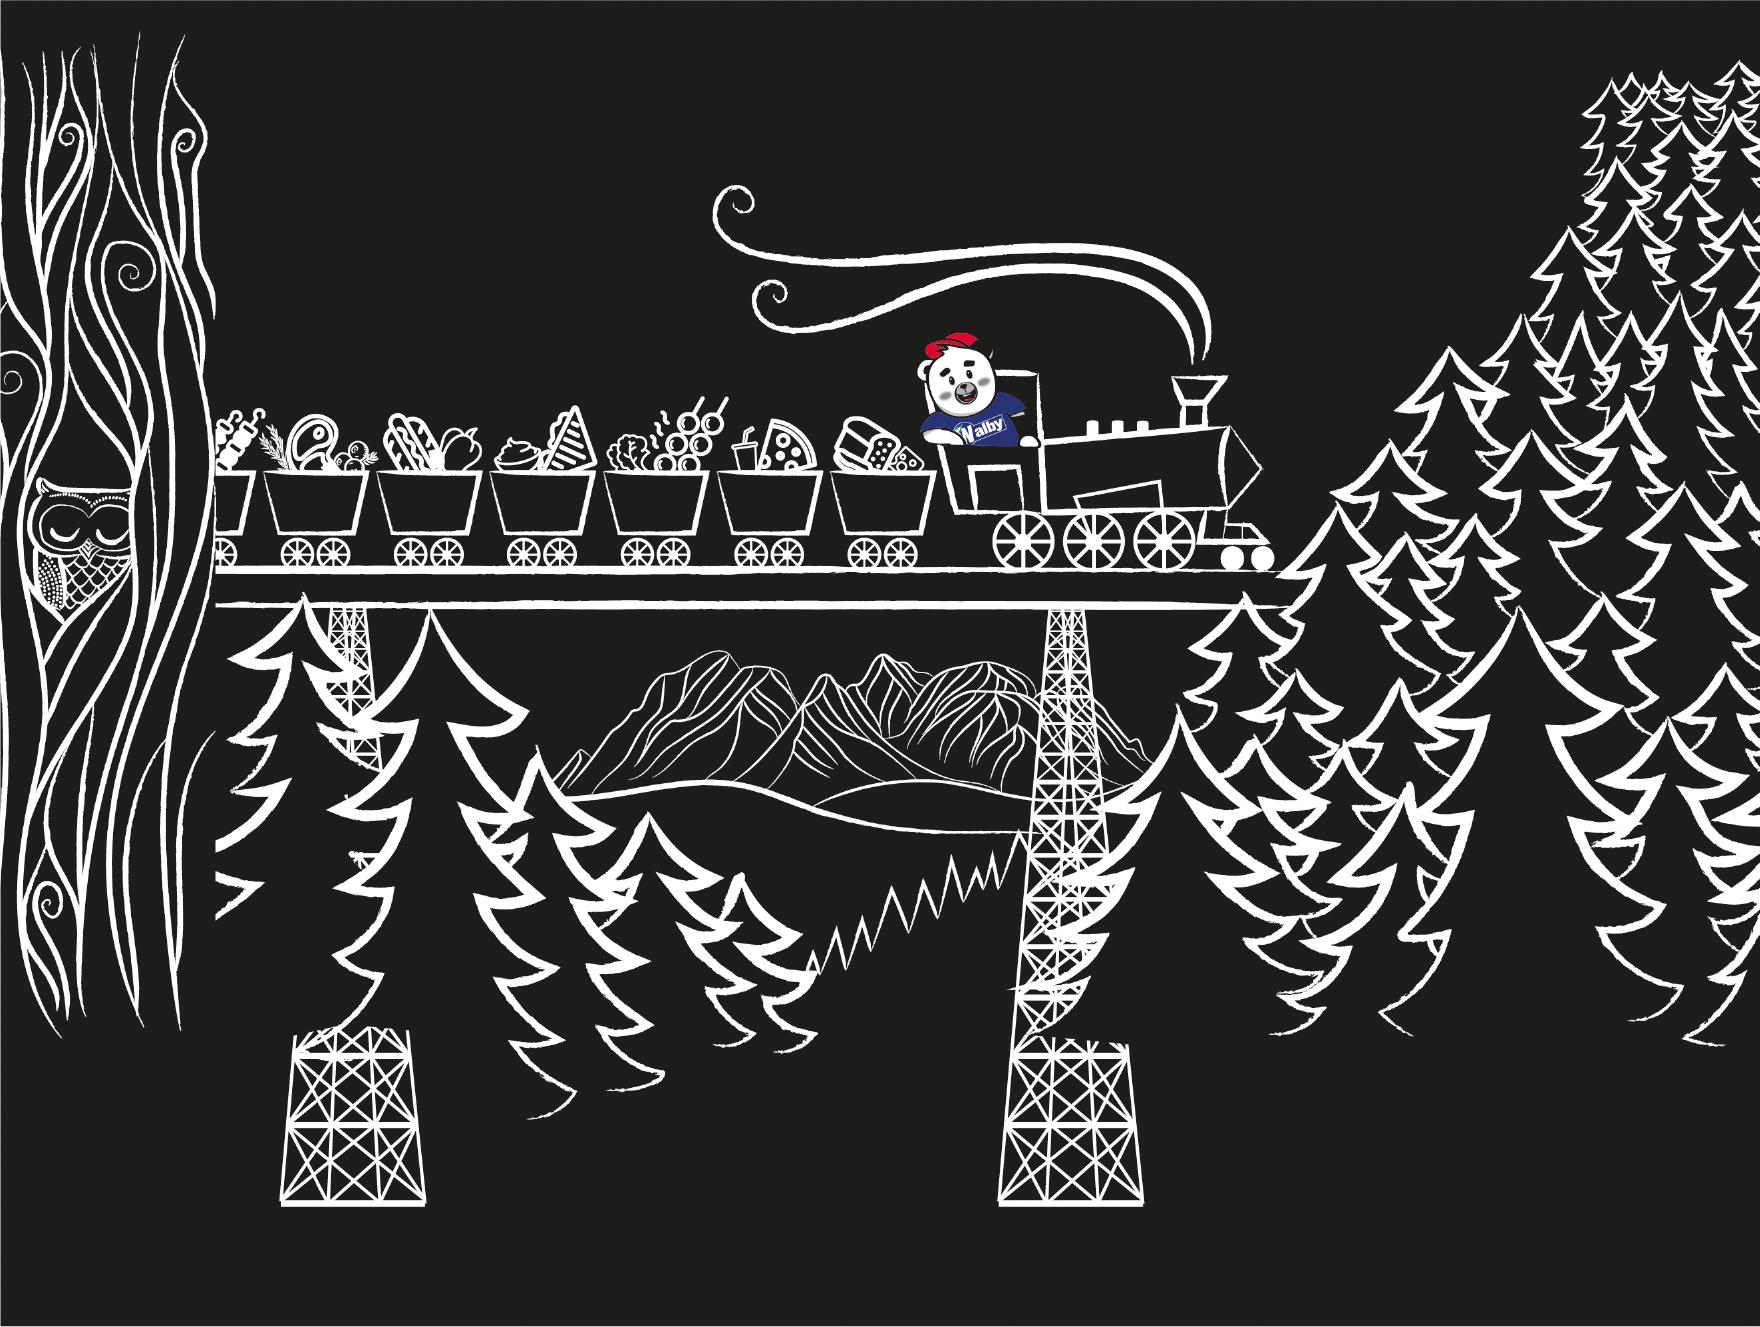 walber-01